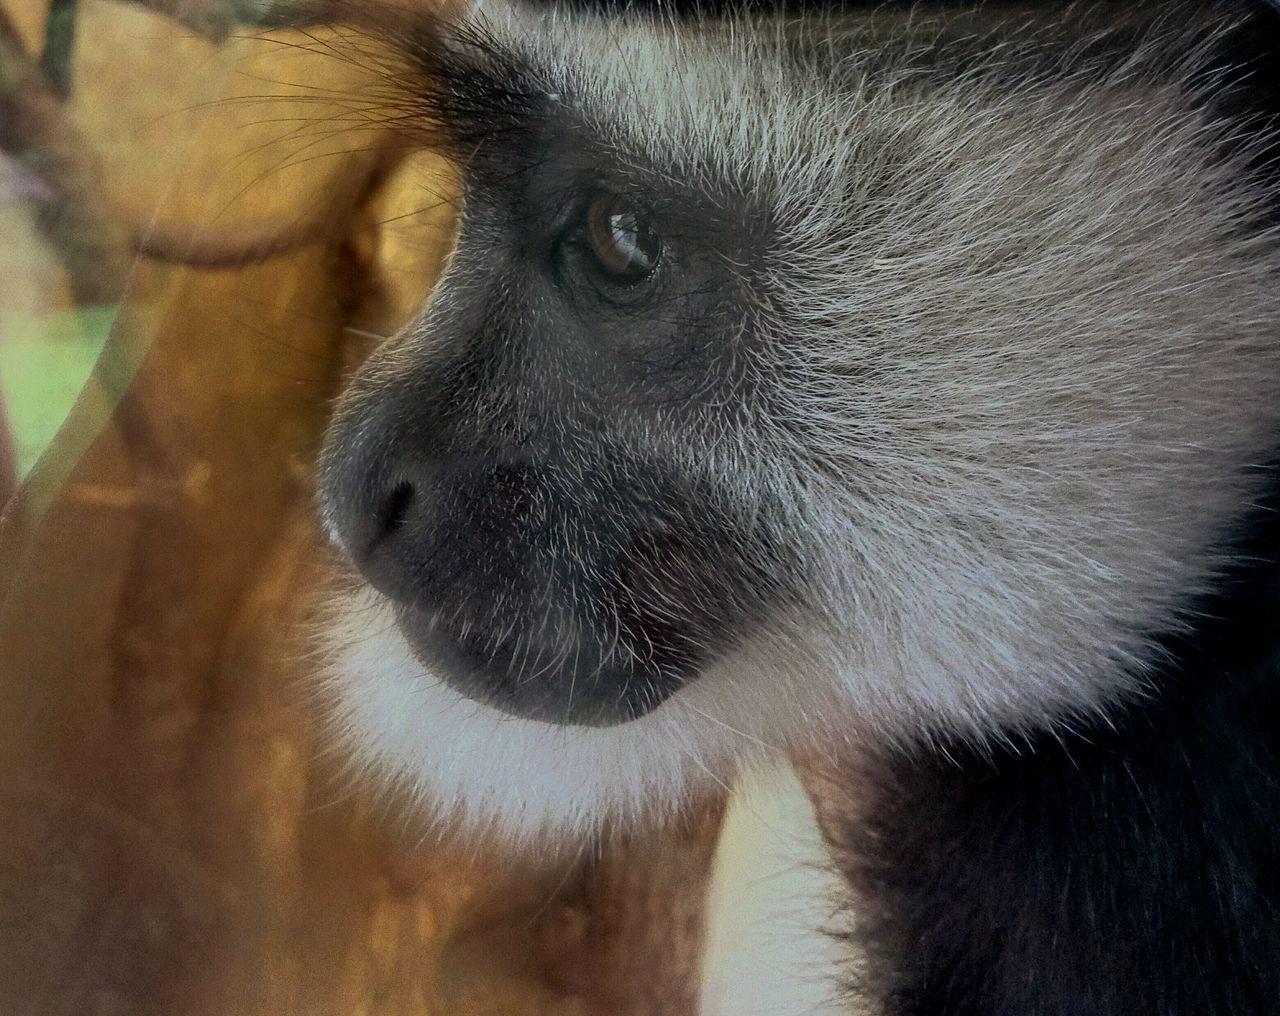 Eyes Never Lie Innocent Eyes Beautifulcreation Fashionhair Animal Photography Monkey Face